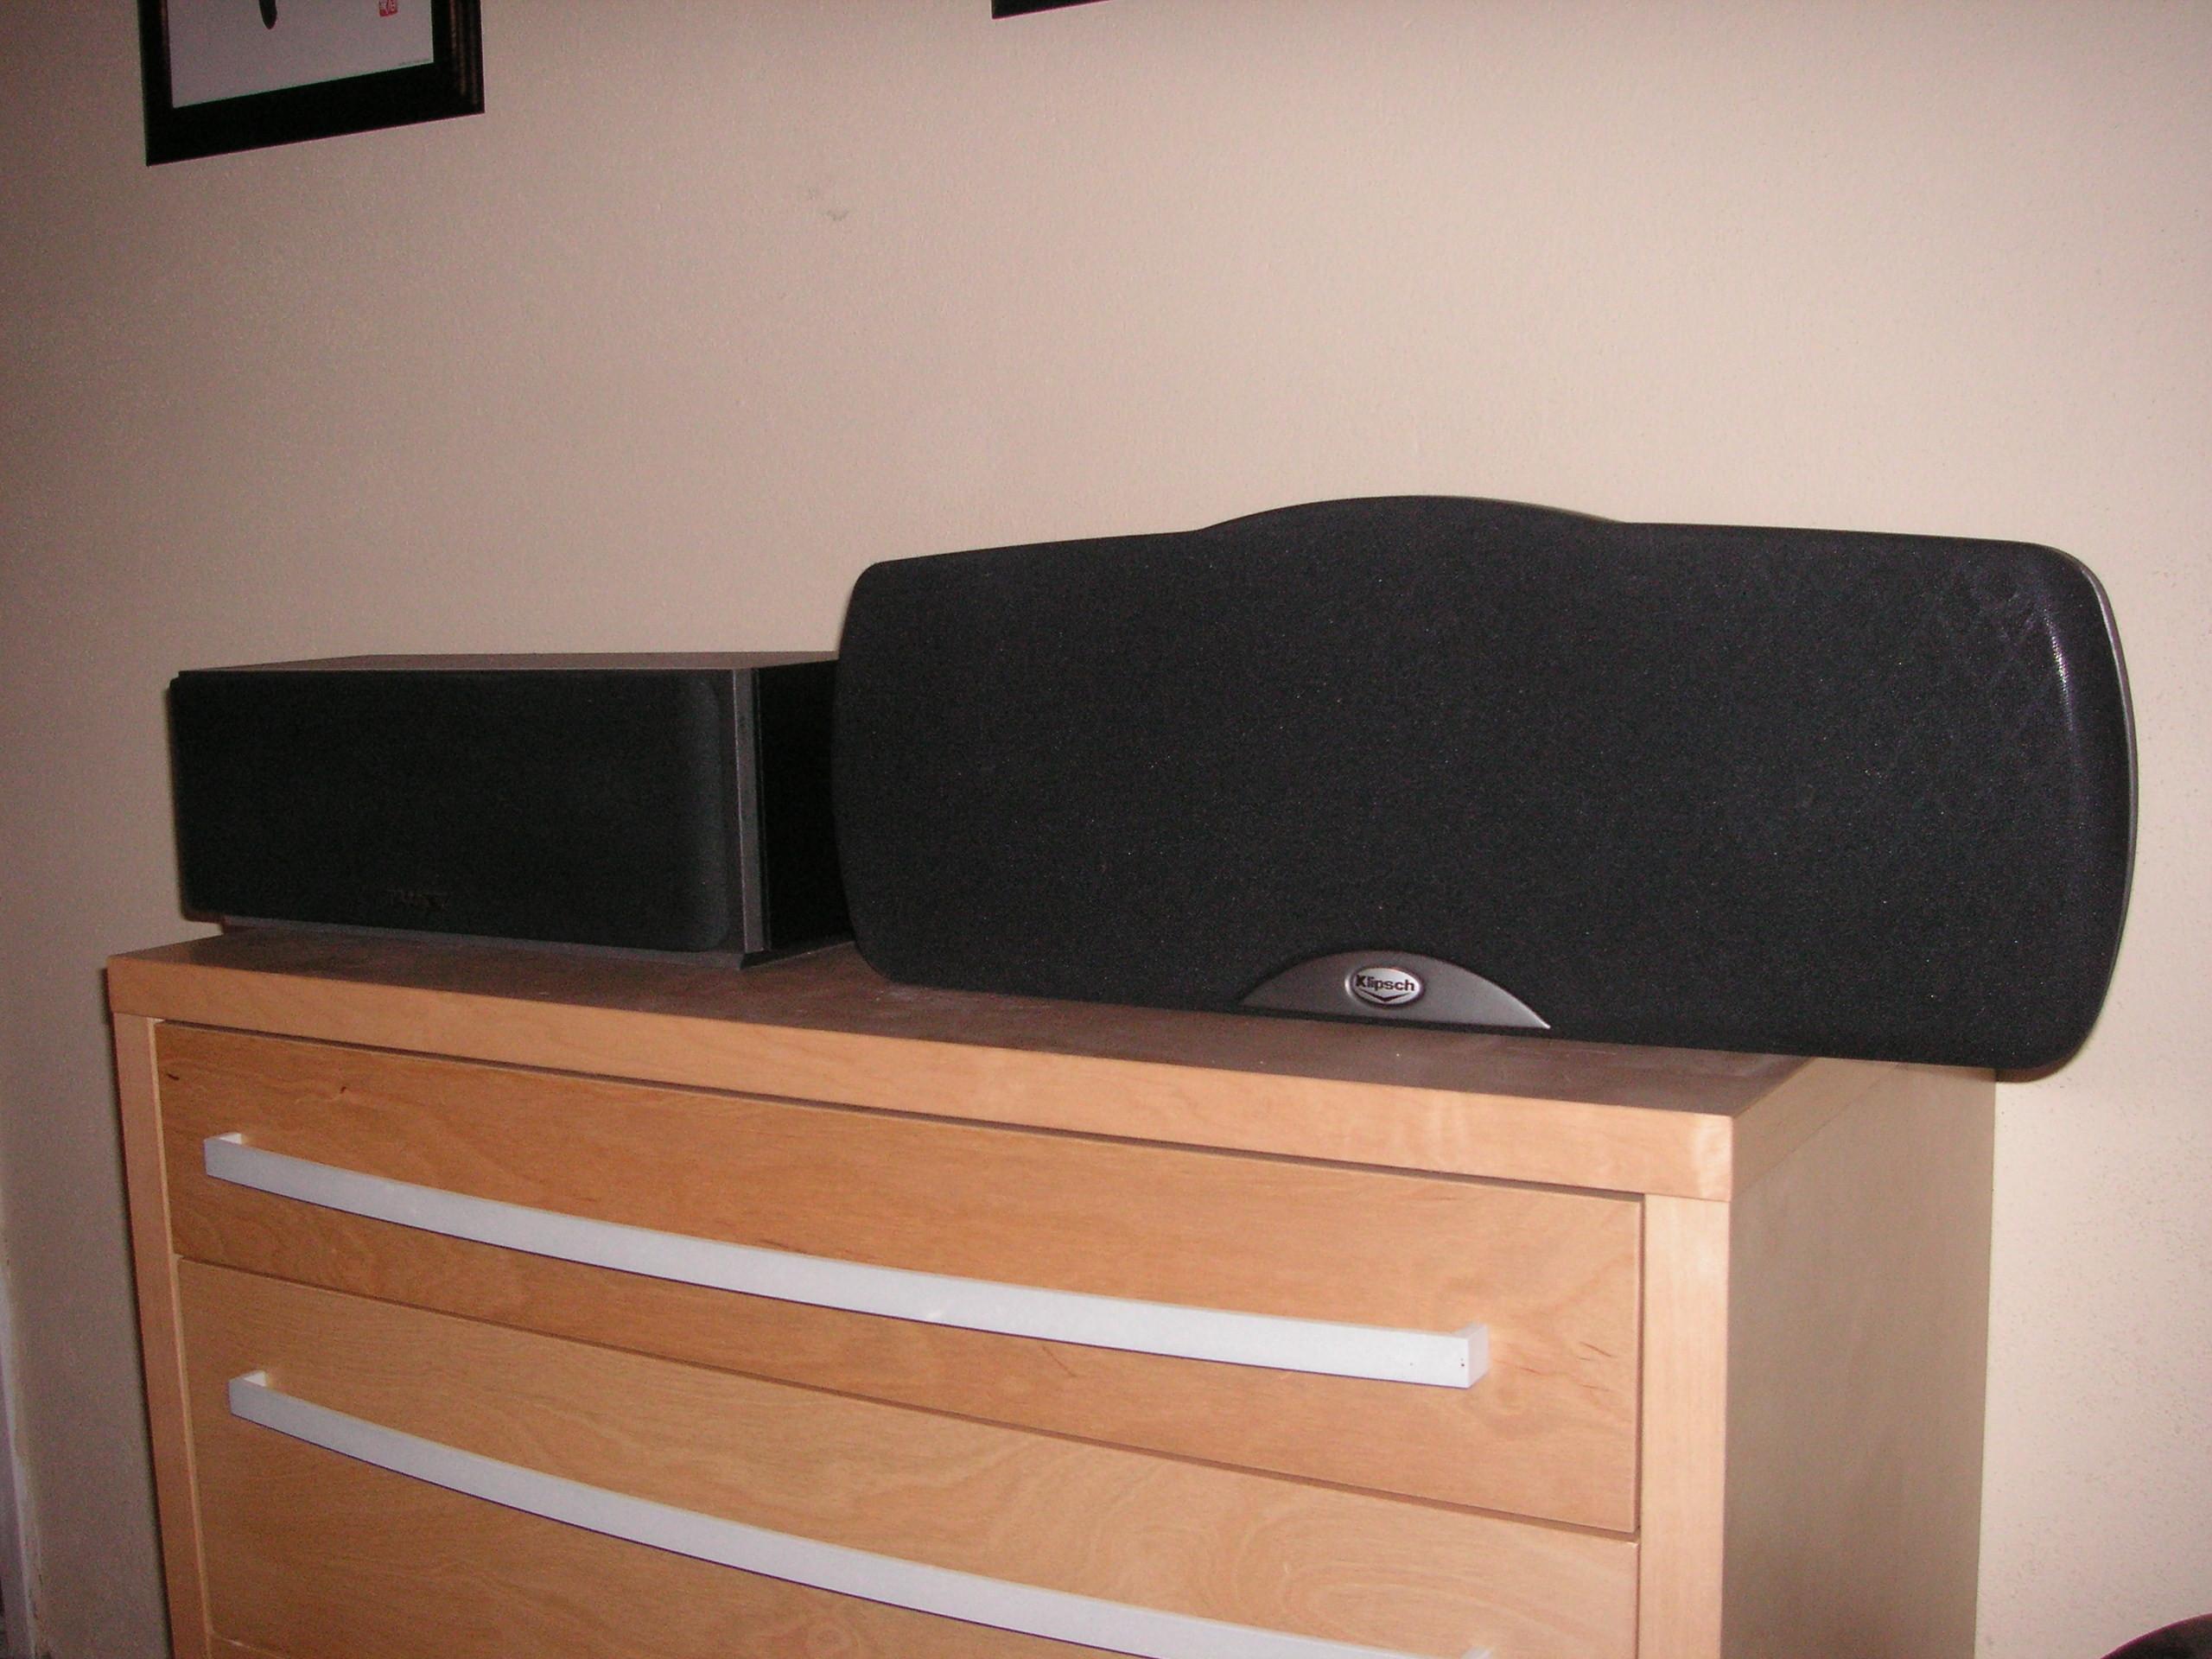 bilder p klipsch synergy c 3 centerh gtalare. Black Bedroom Furniture Sets. Home Design Ideas